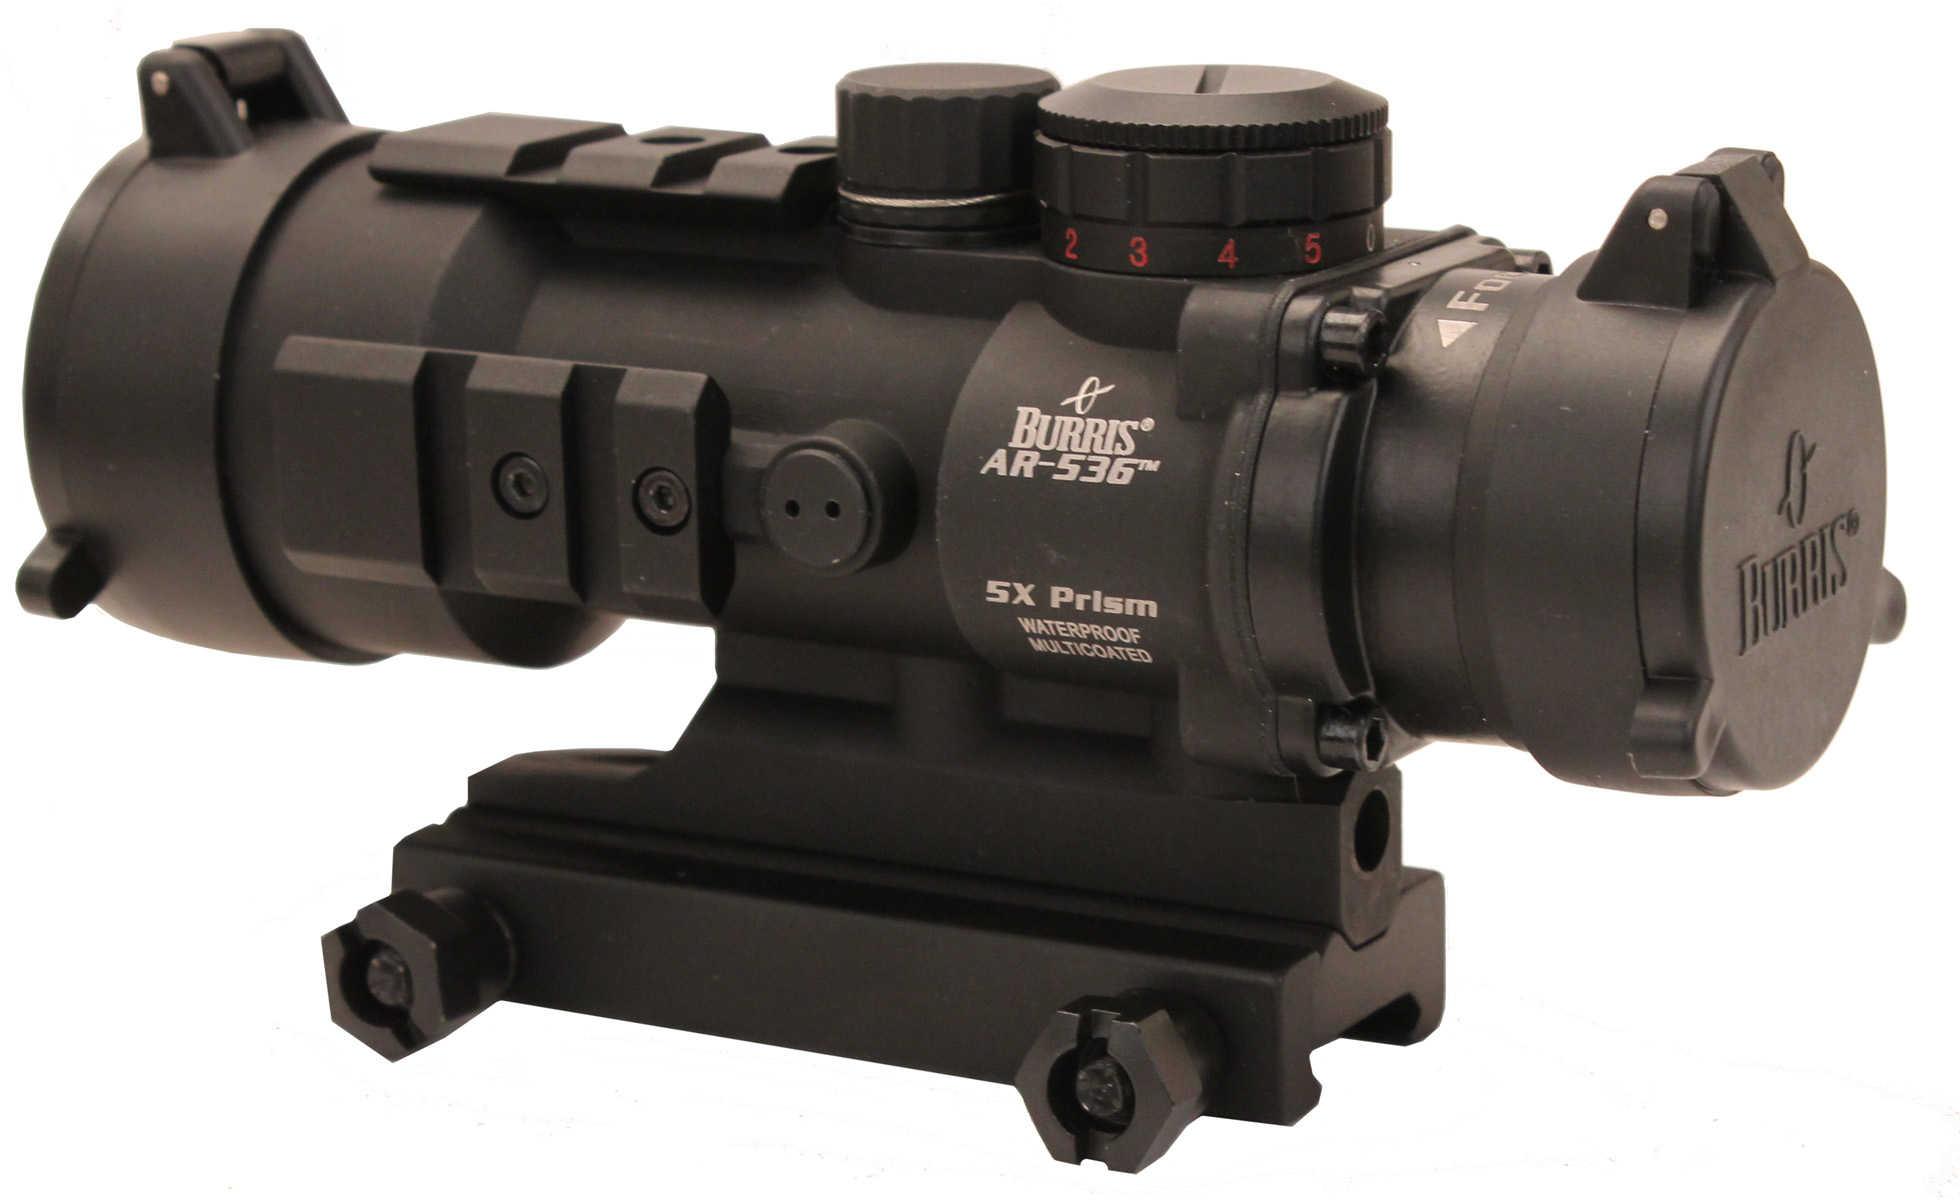 Burris Prism Sight 5x 36mm Obj Eye Relief 4 MOA Dot Matte Black 300210